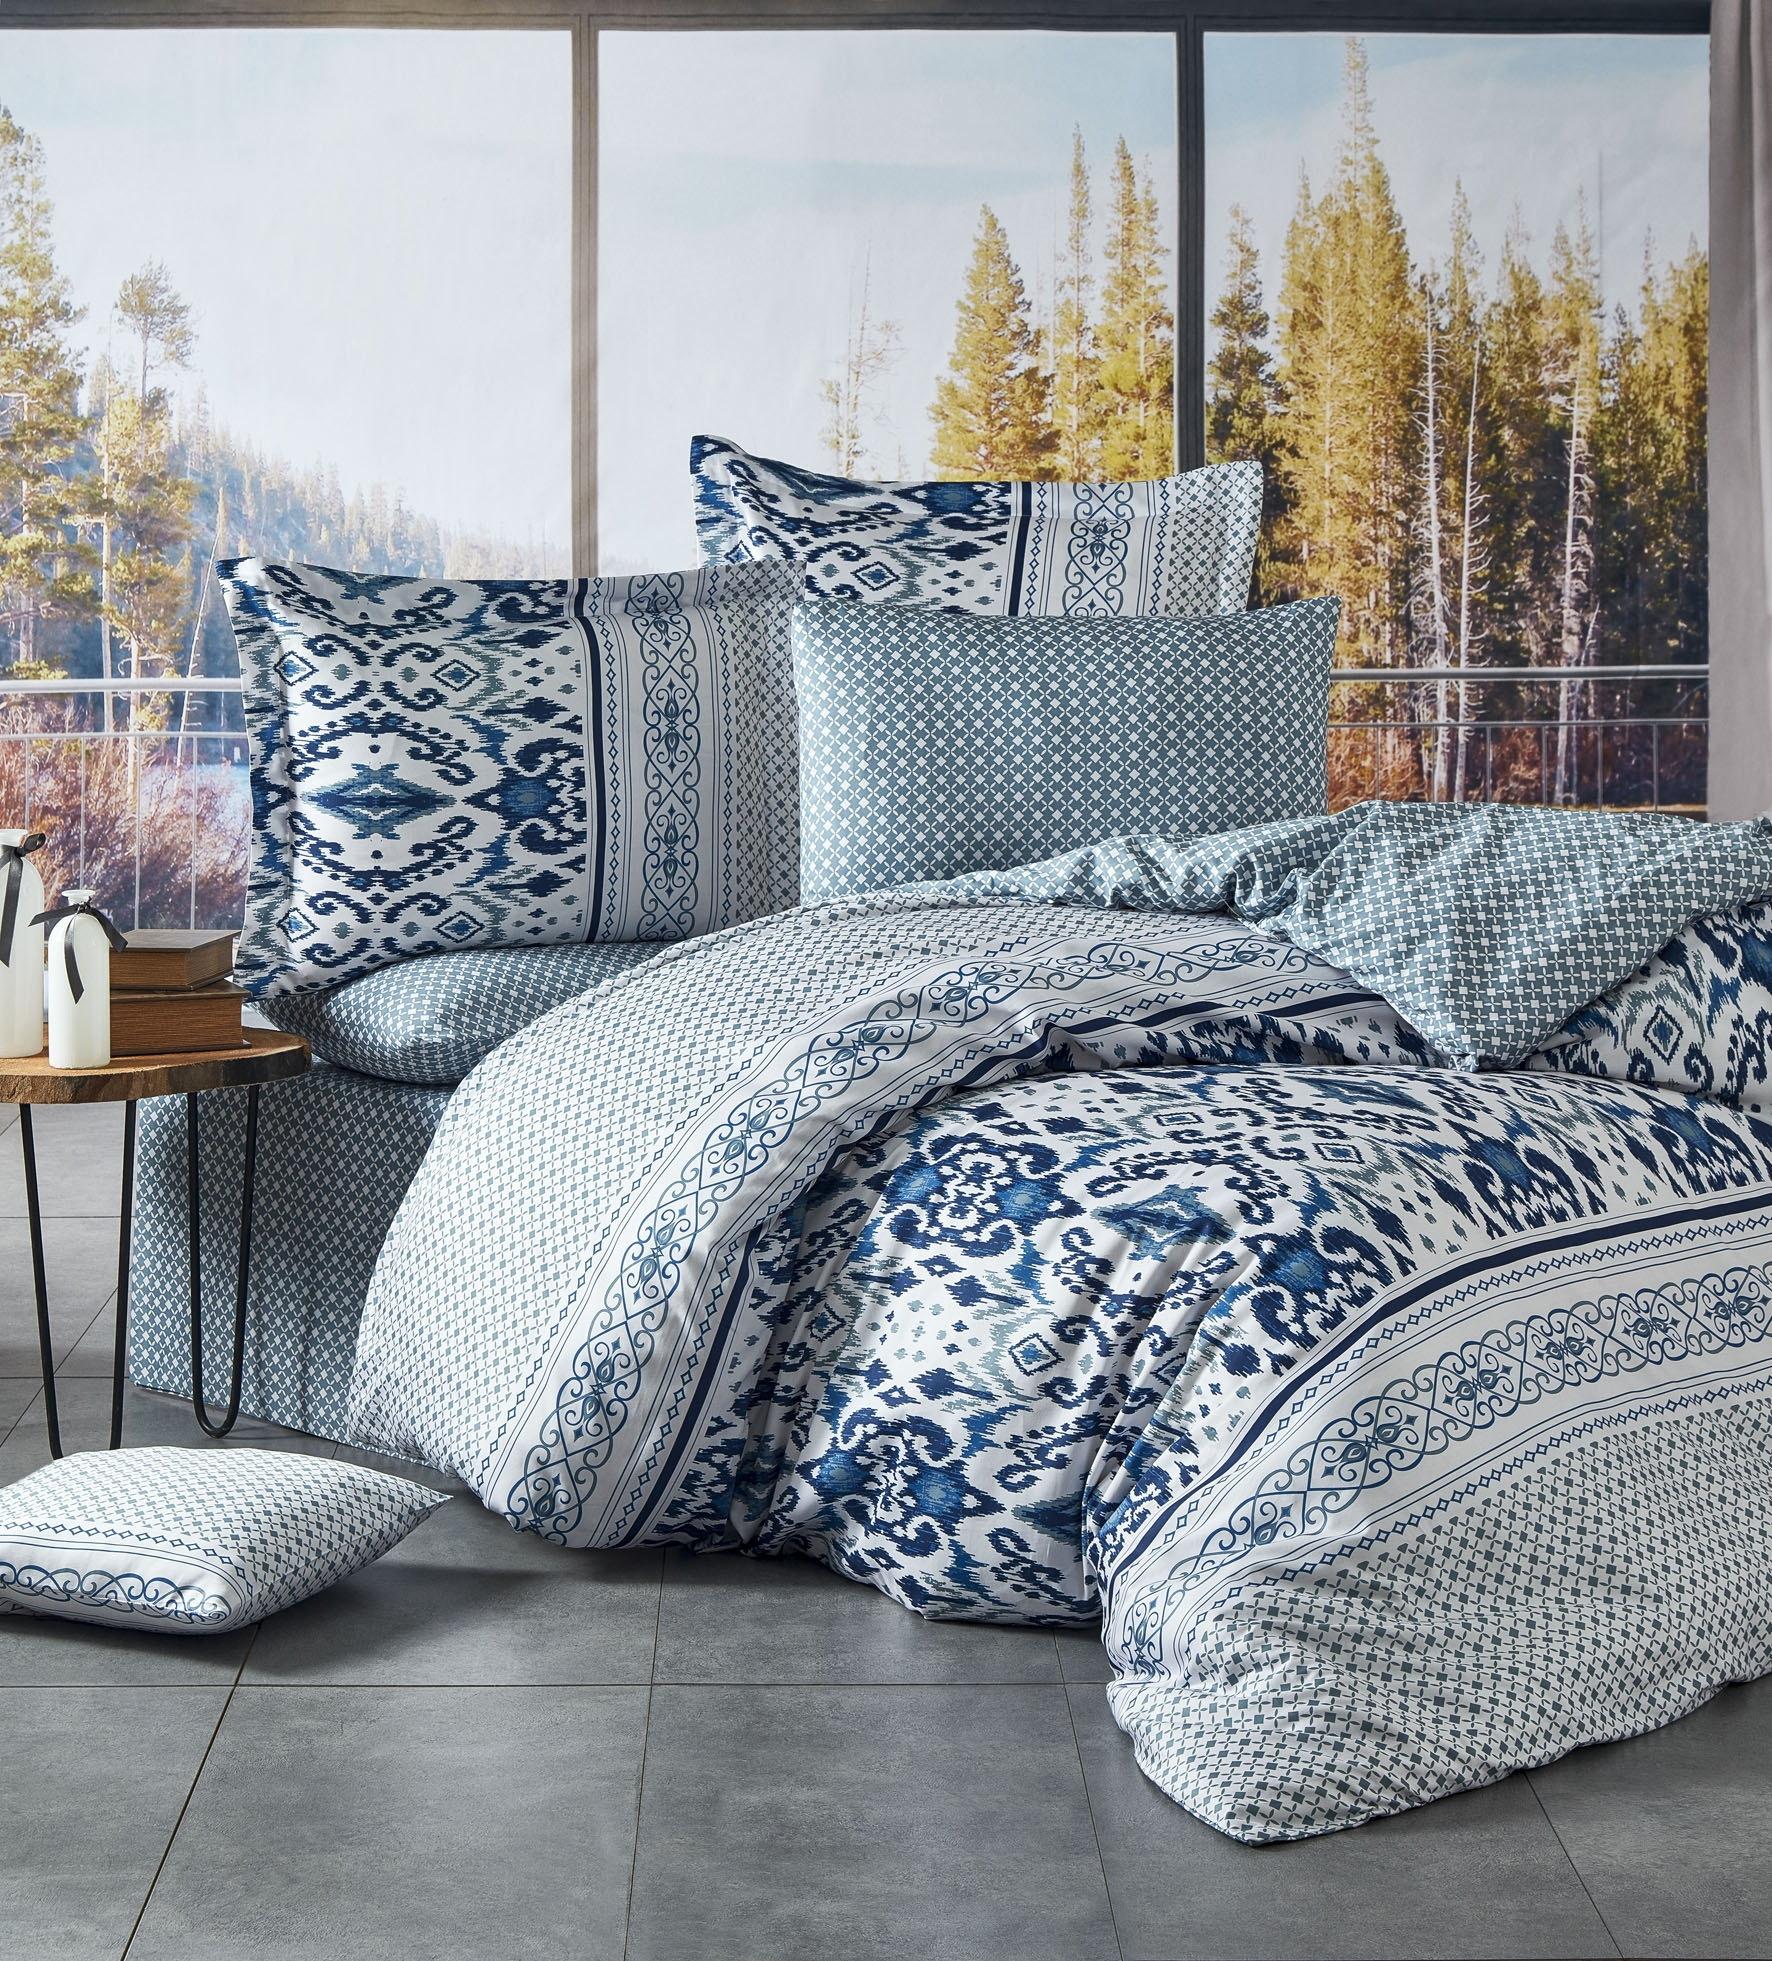 Lenjerie de pat din bumbac satinat Kirlow Albastru / Alb, 200 x 220 cm